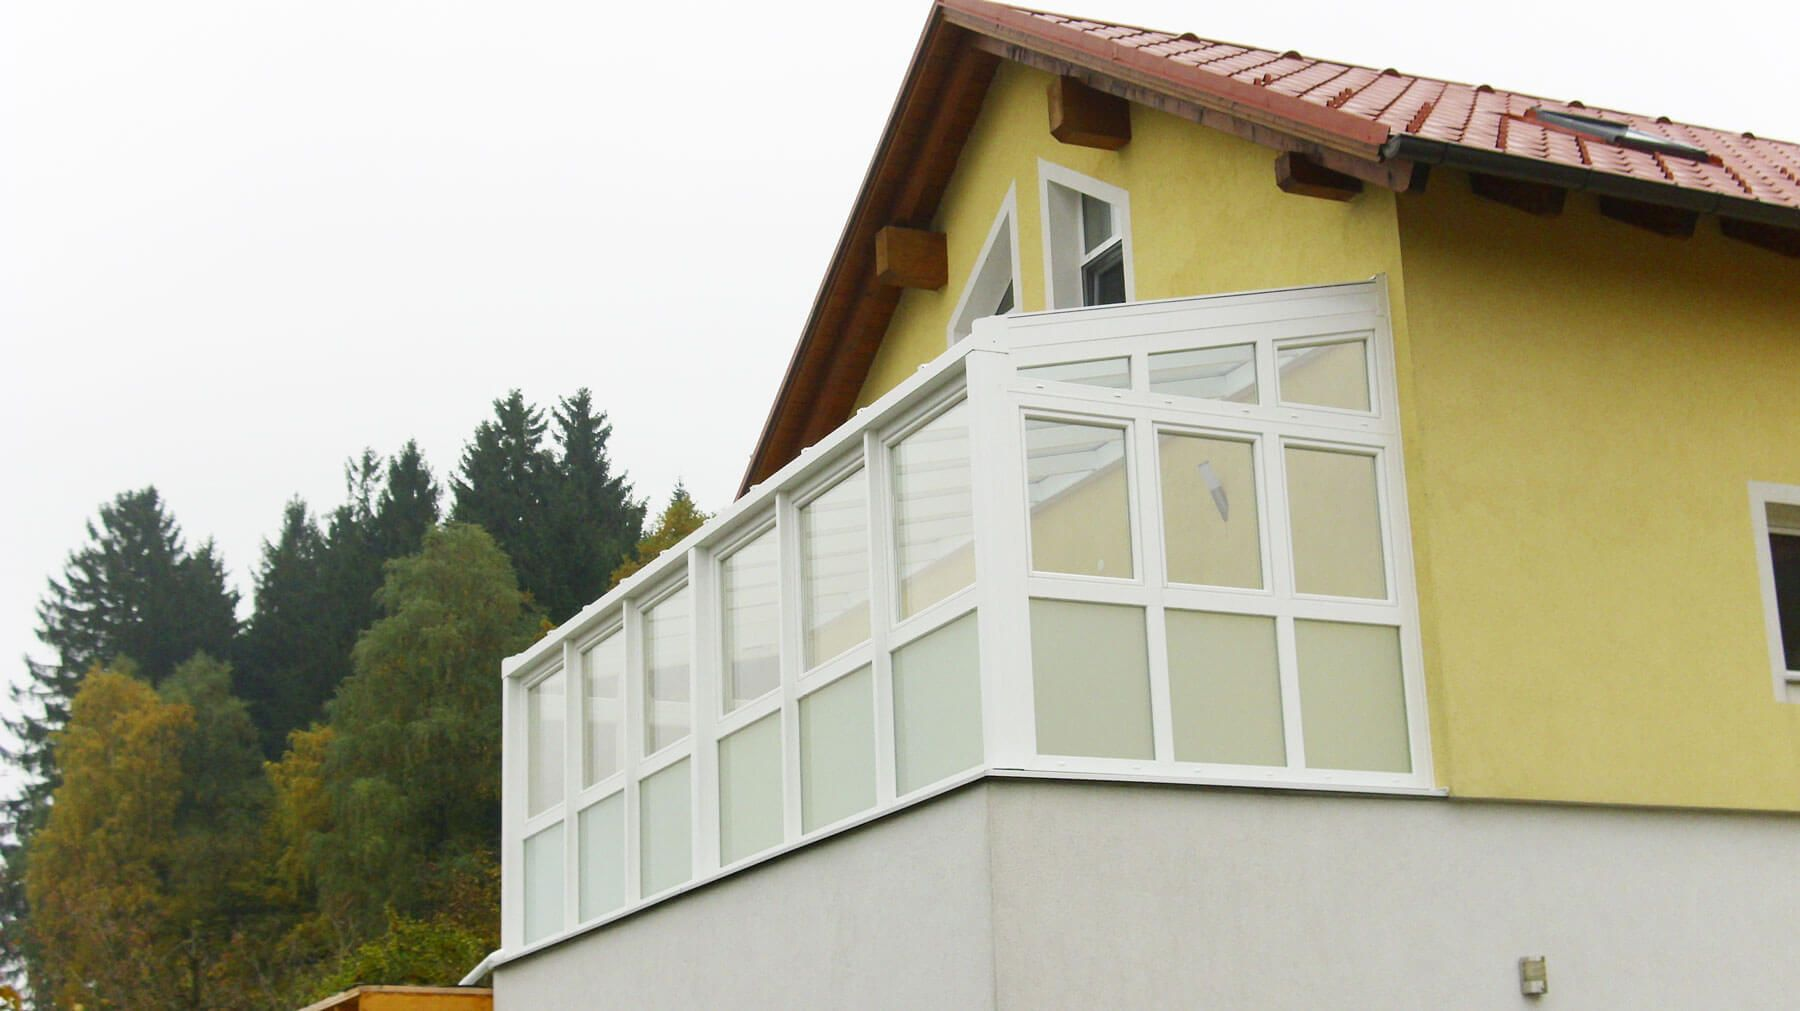 Wintergarten Kunststoff mit DrehKipp Fenster in weiß